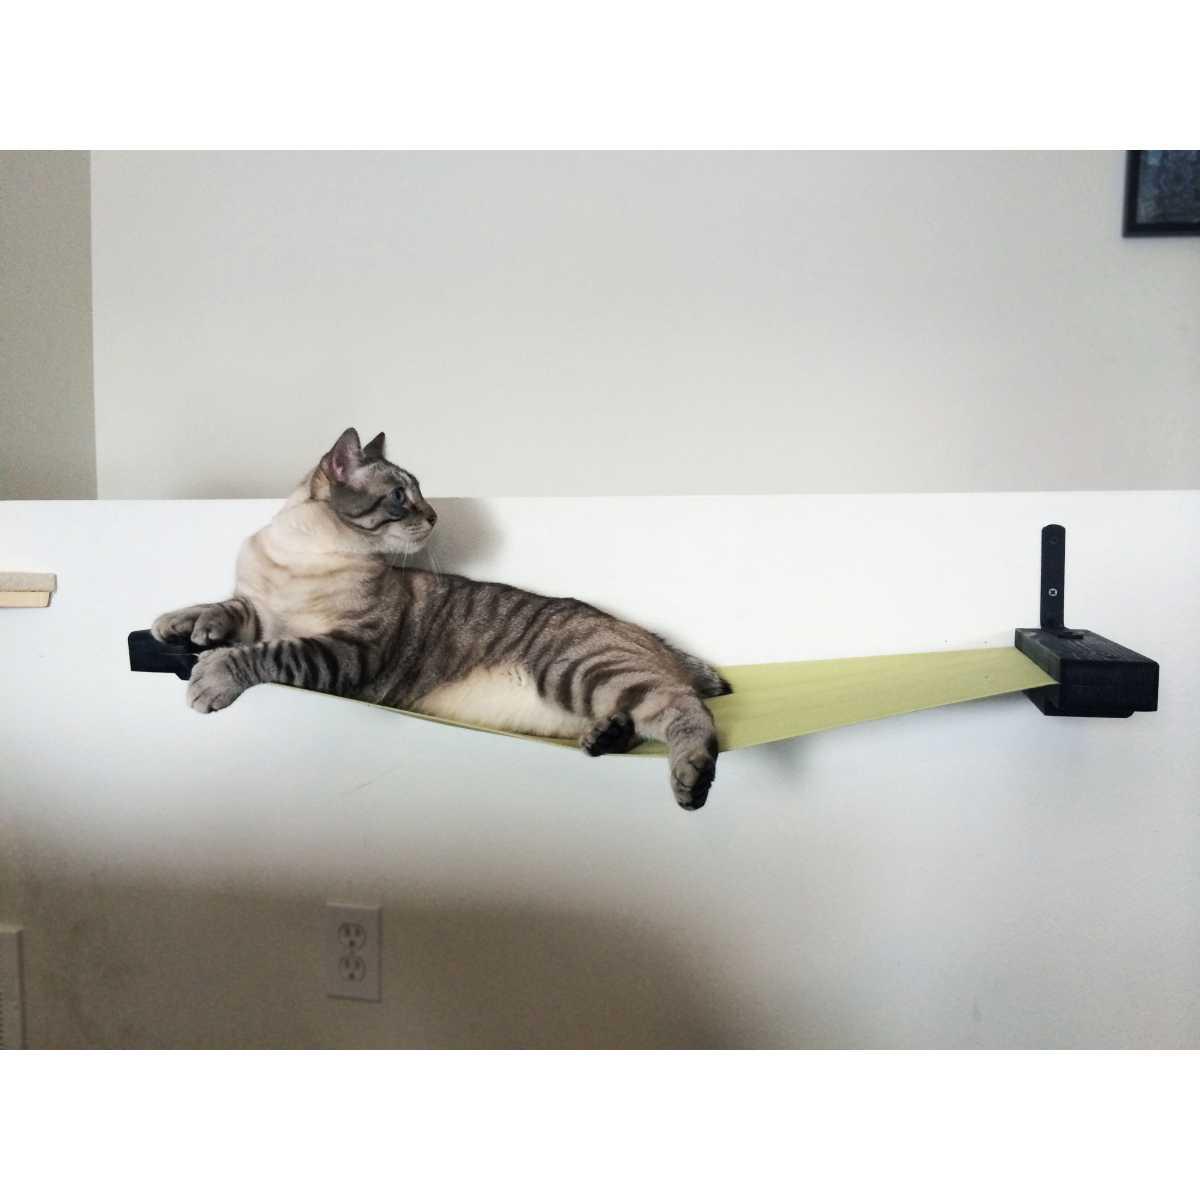 Catastrophicreations 32 Inch Hammock Cat Shelf Catsplay